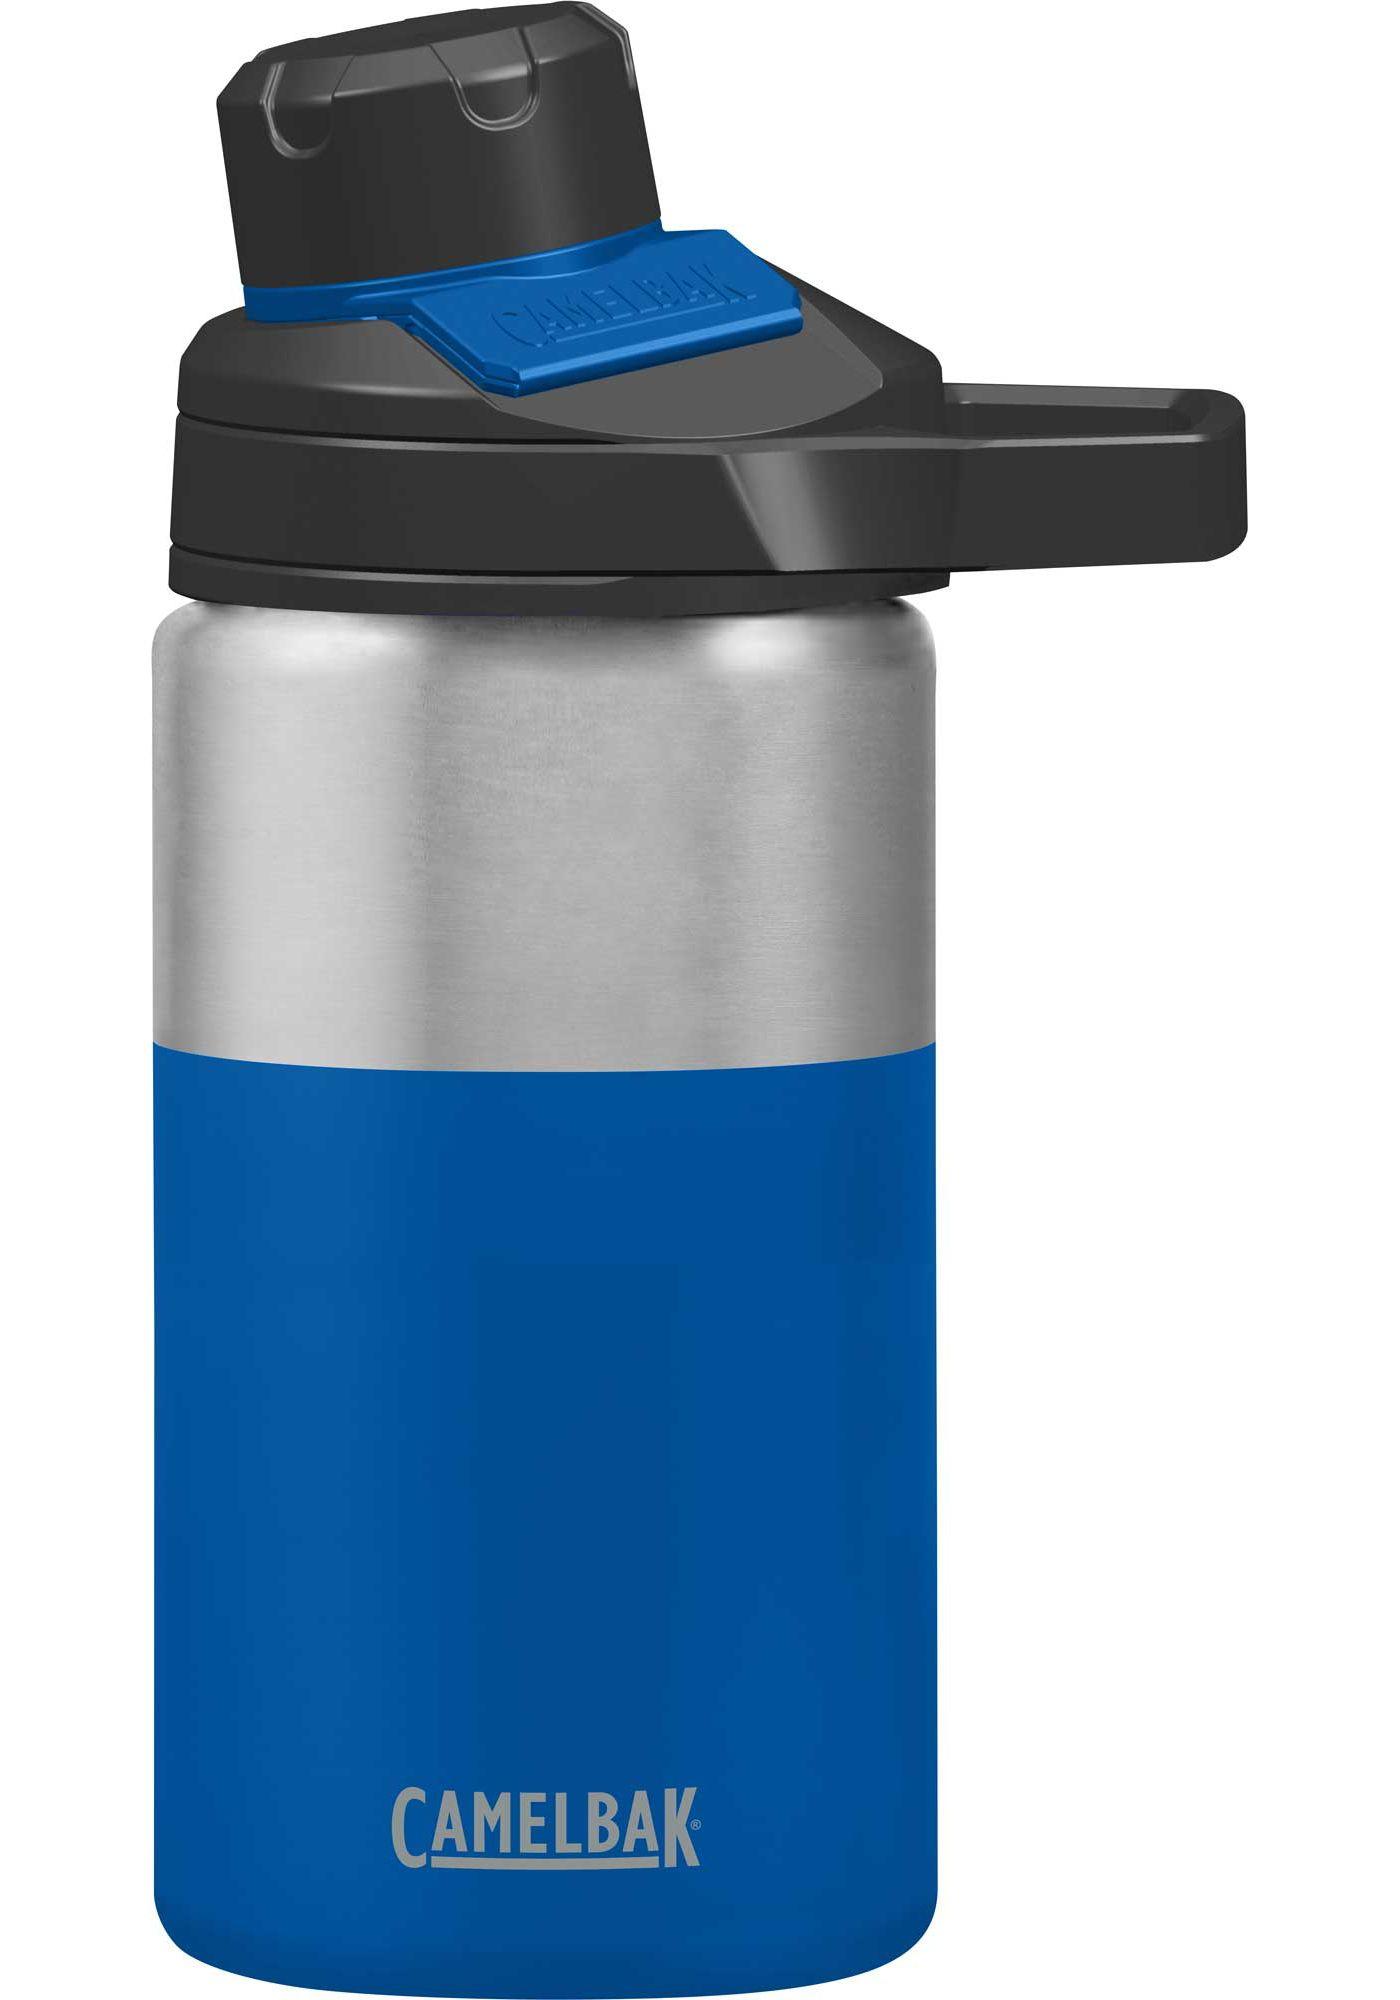 CamelBak Chute Mag Vacuum Insulated Stainless Steel 12 oz. Bottle